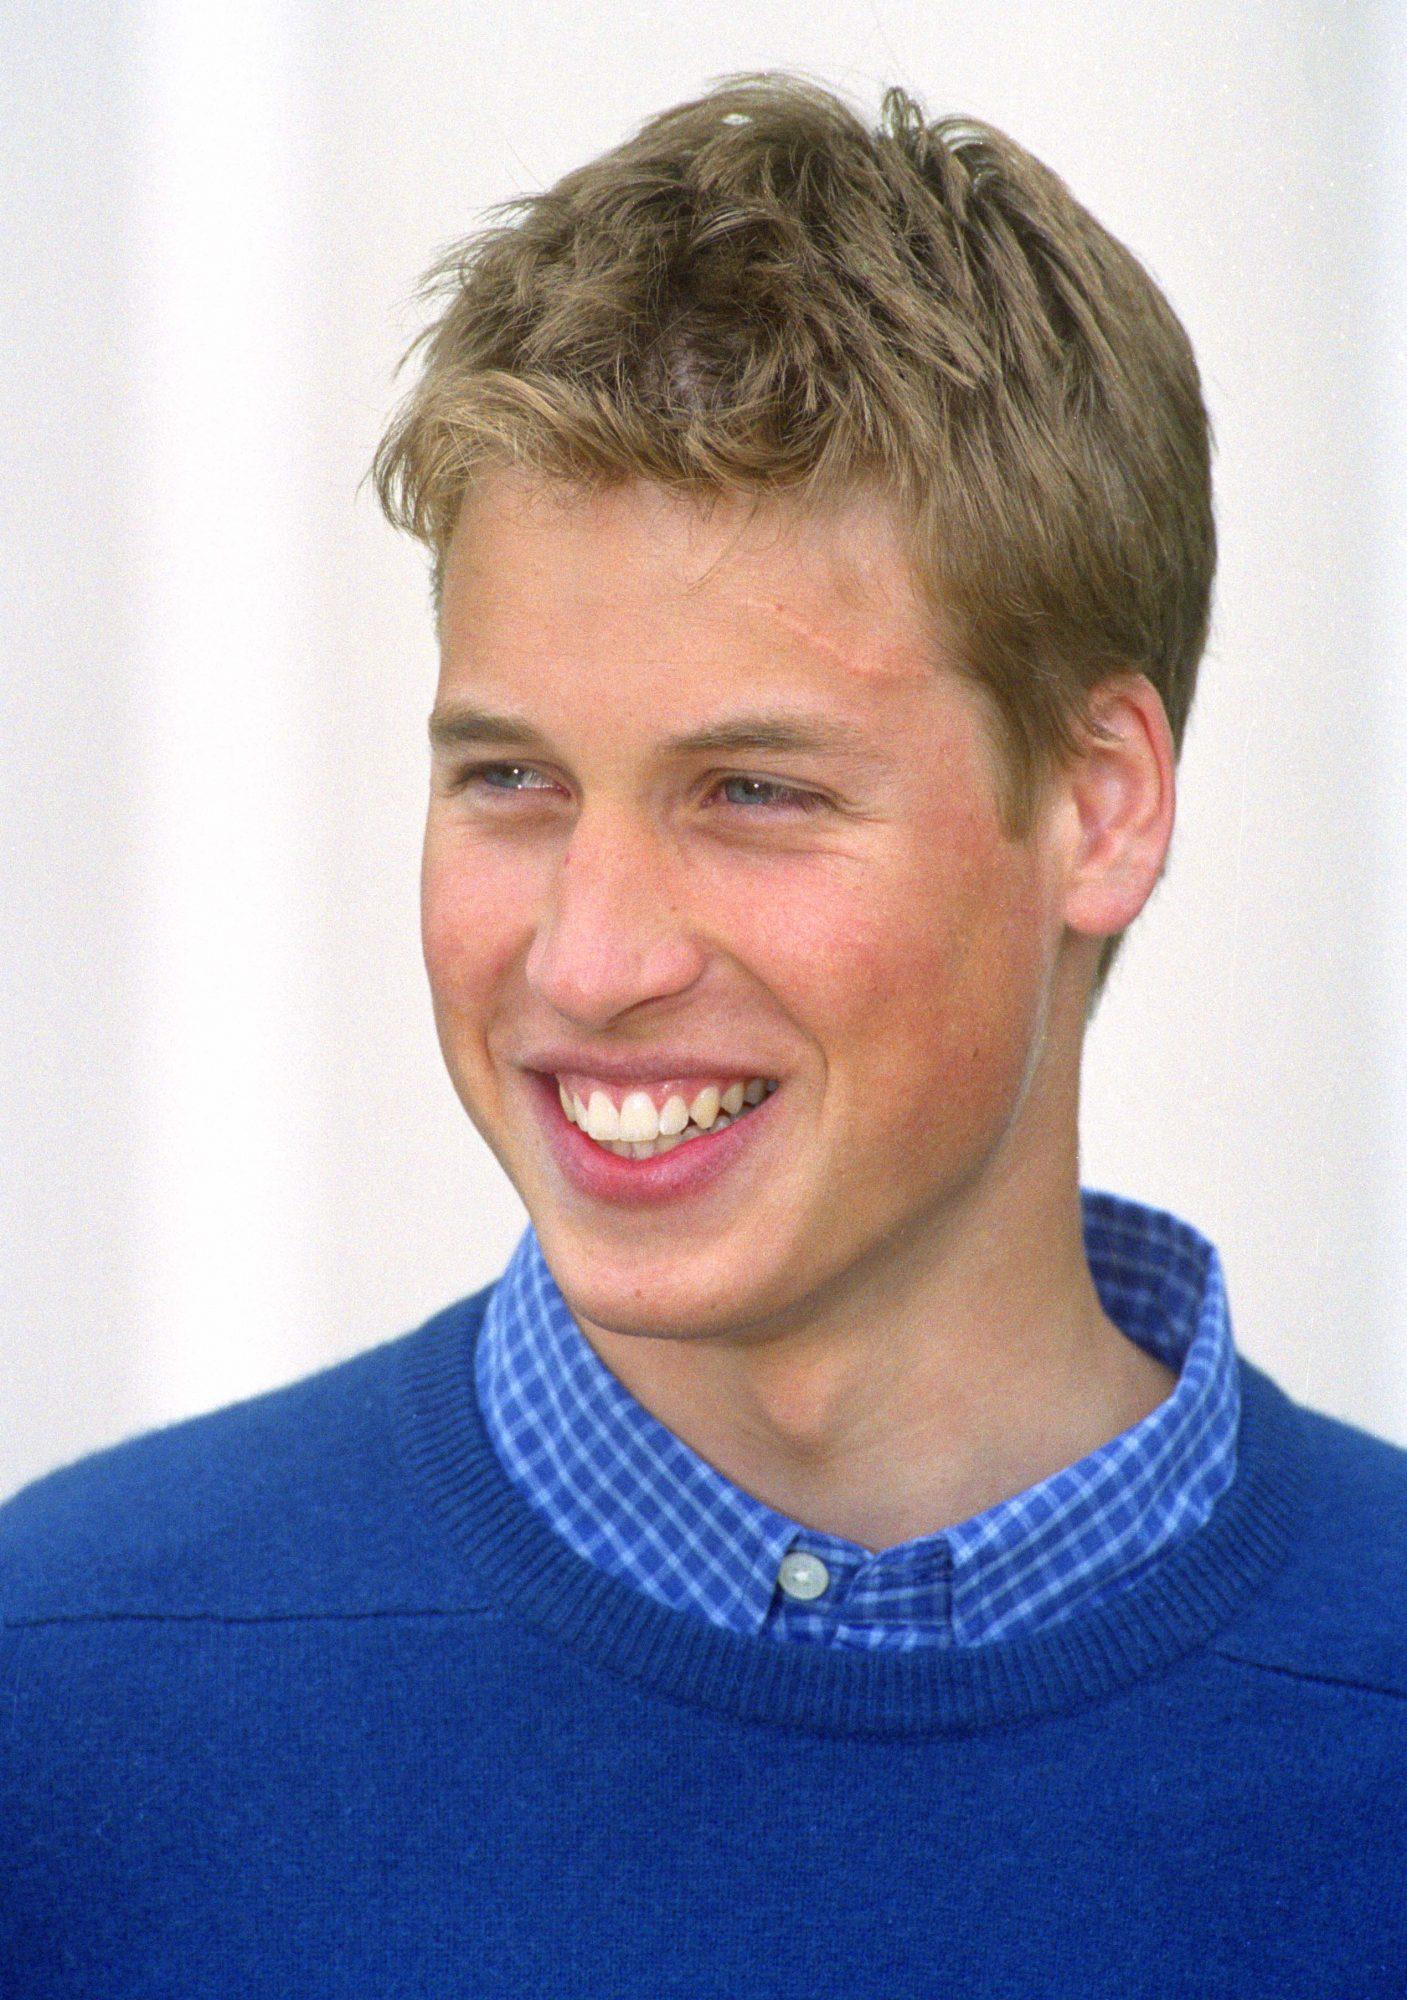 Prince-William-scar.jpg